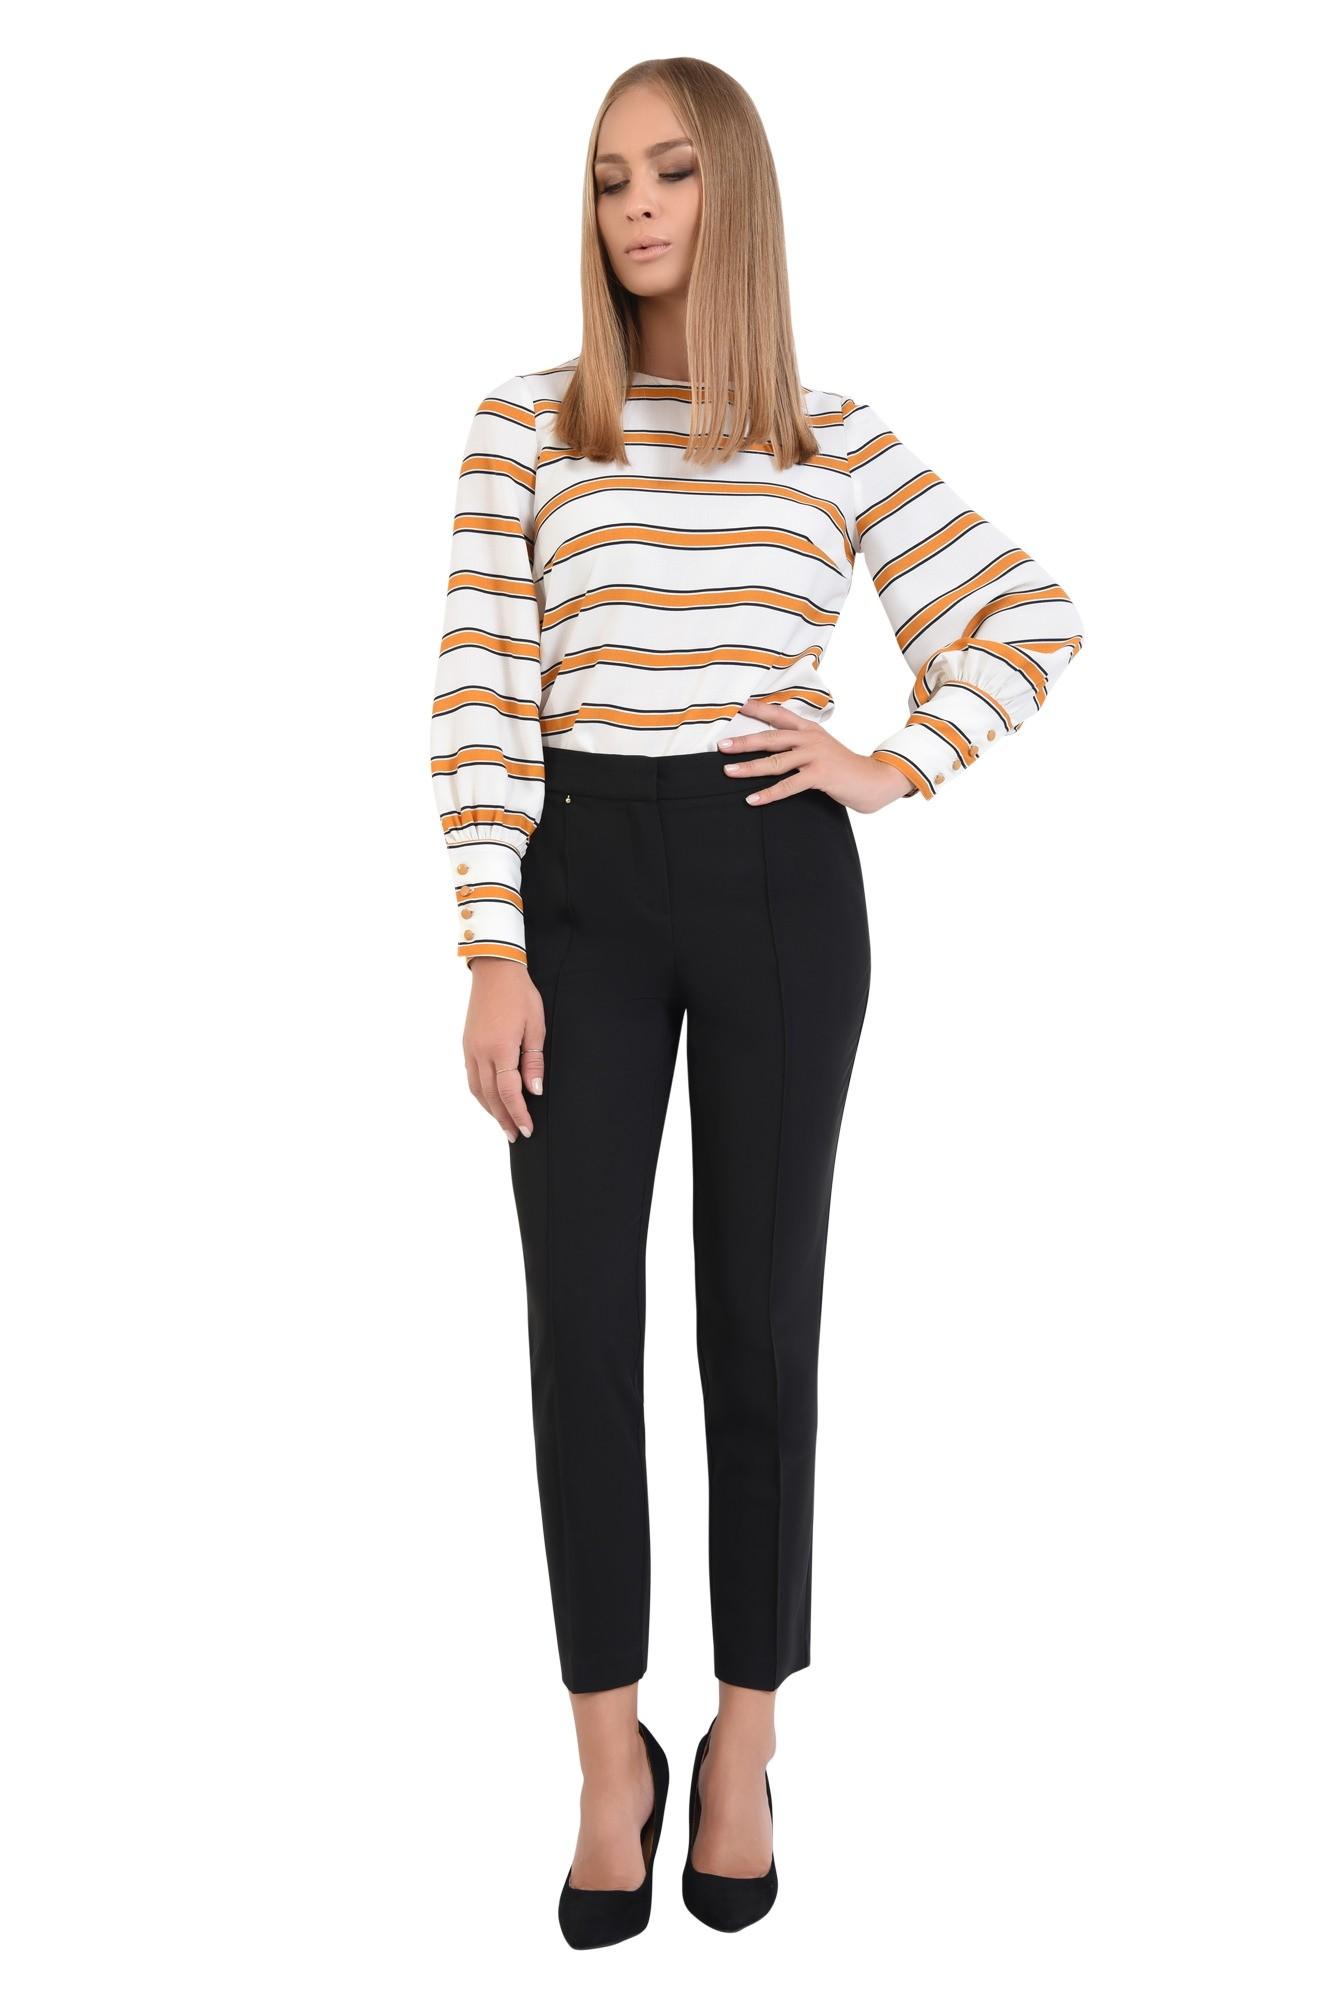 pantaloni conici, negru, talie medie